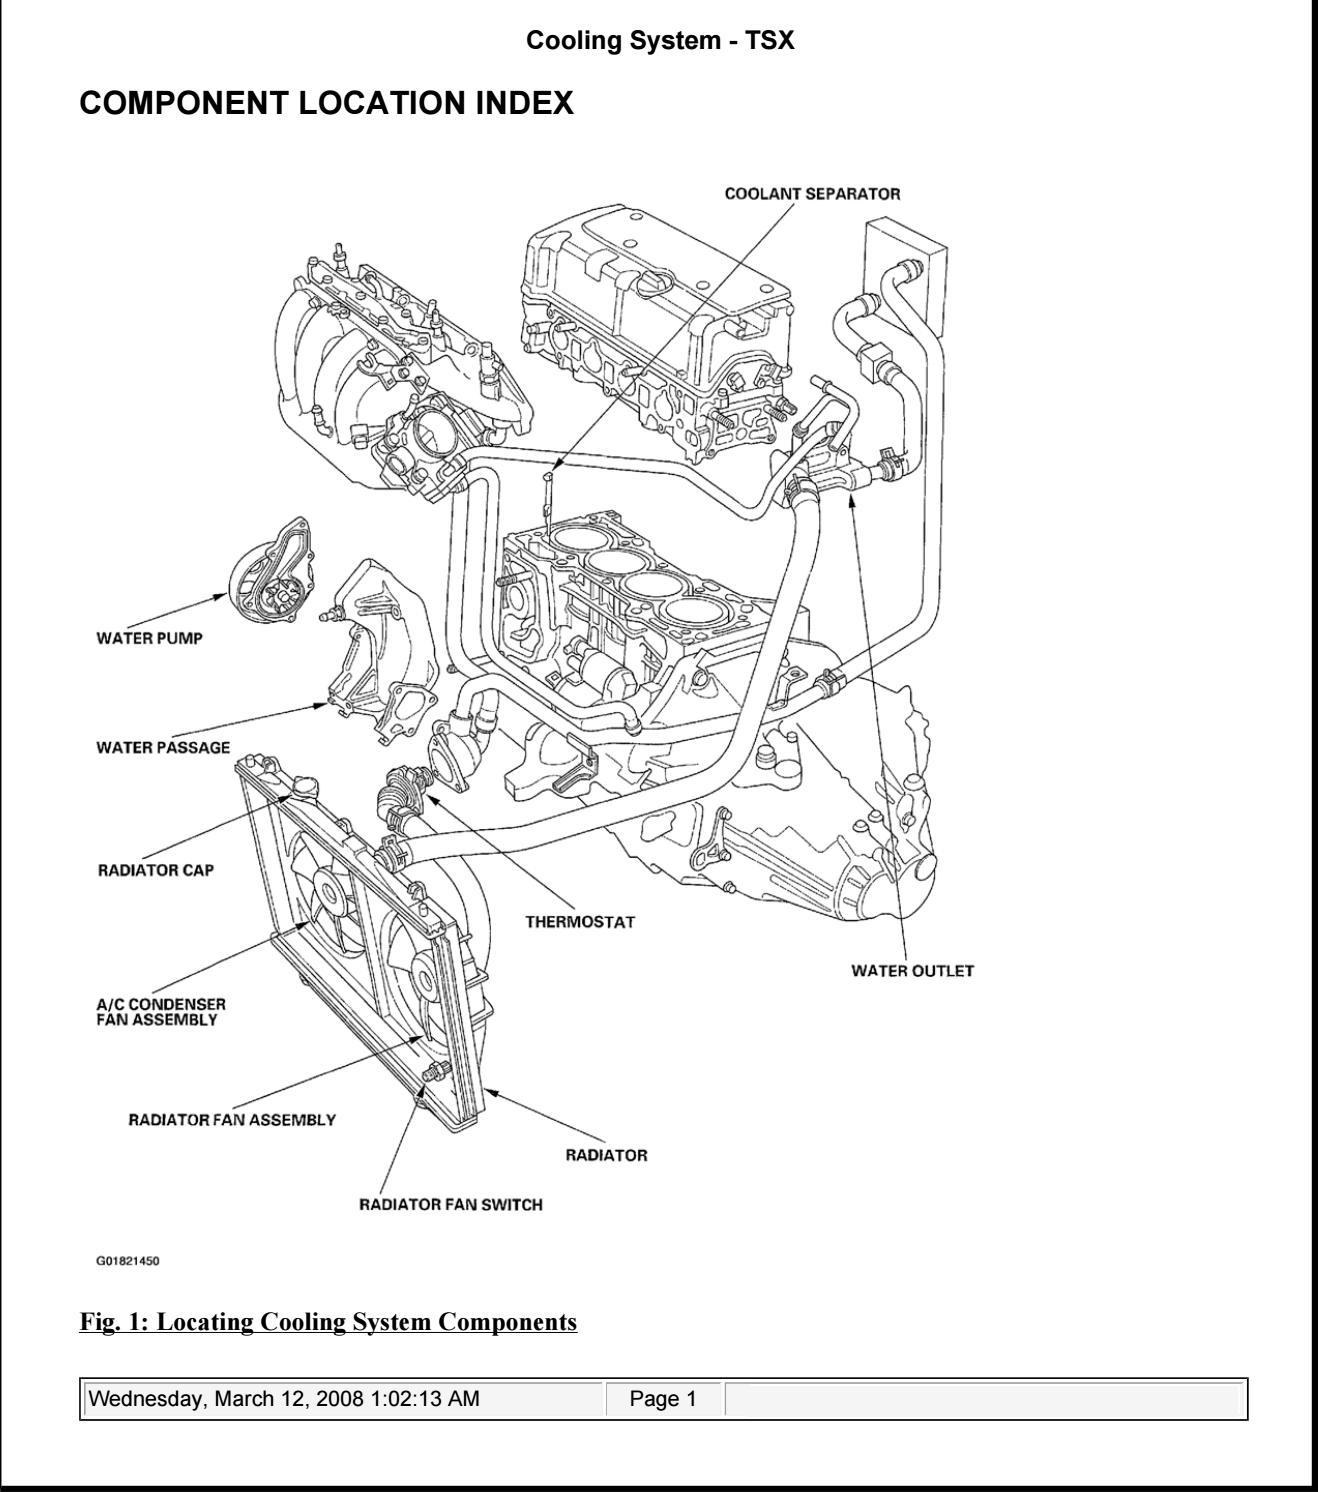 2004 acura tsx service repair manual by ujfjisefjj issuu